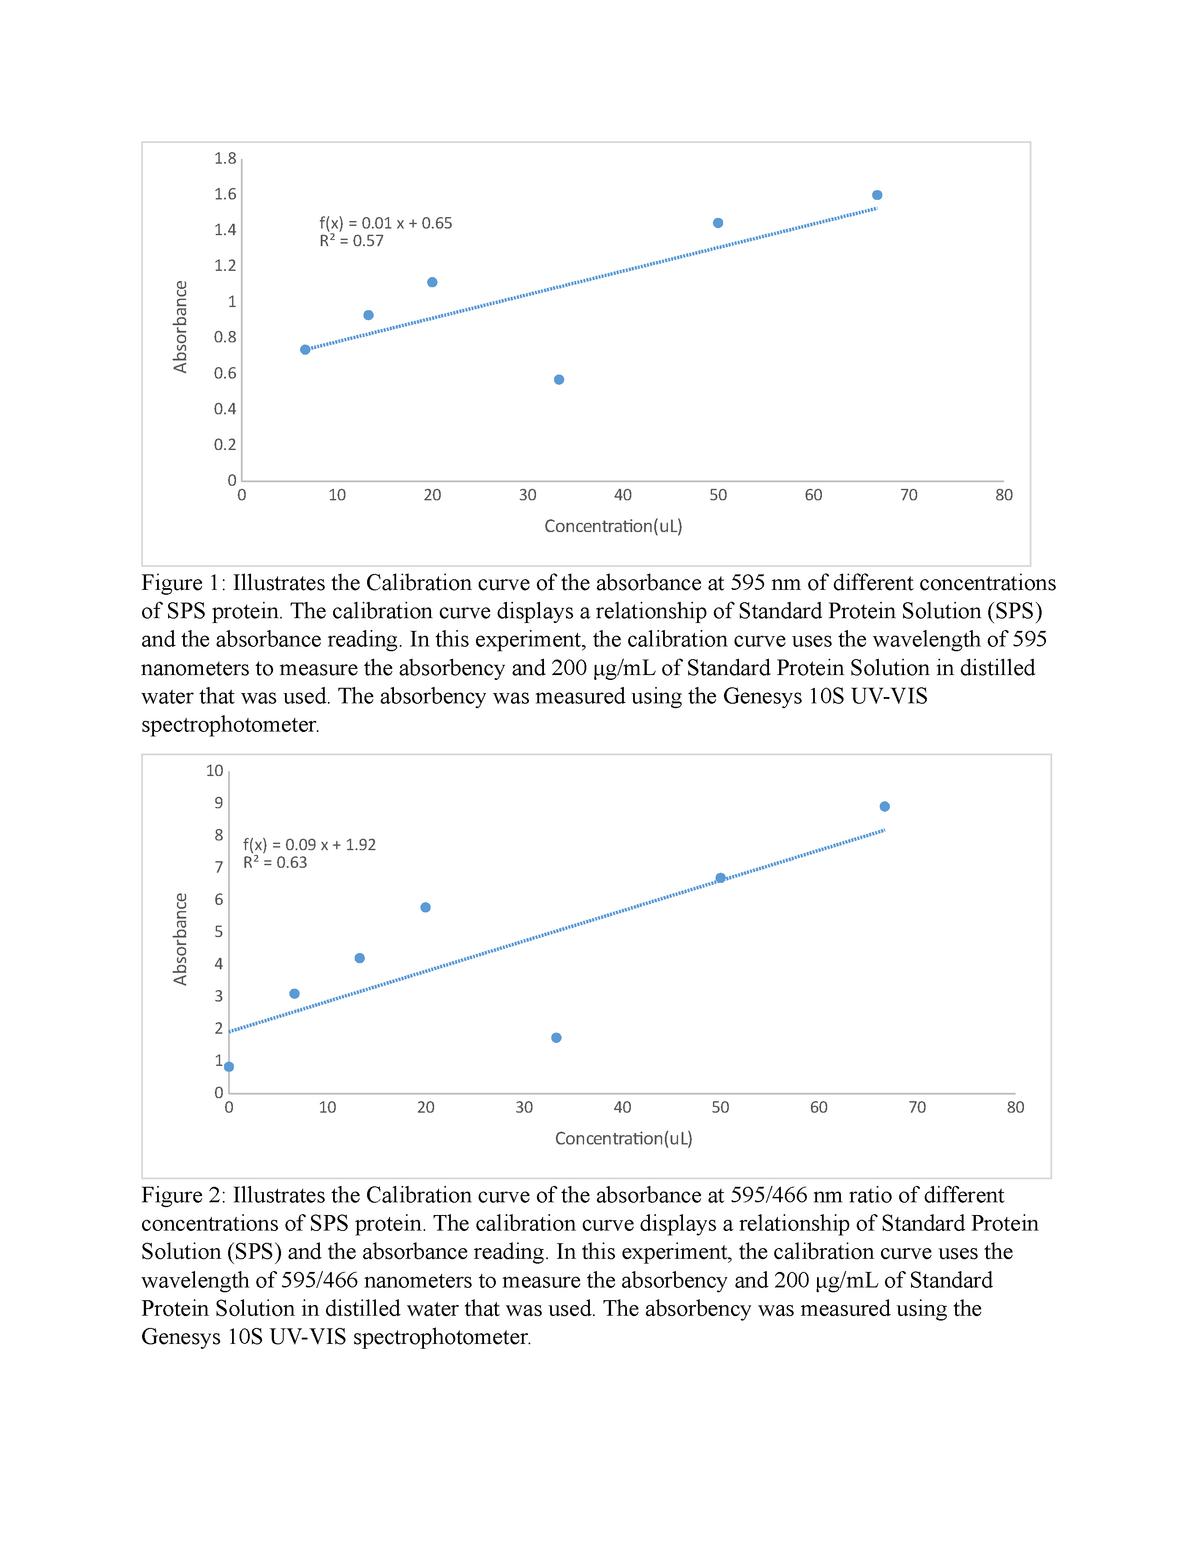 Chem 2360 lab 3 - Lab Report - MBIO 2360 Biochemistry I